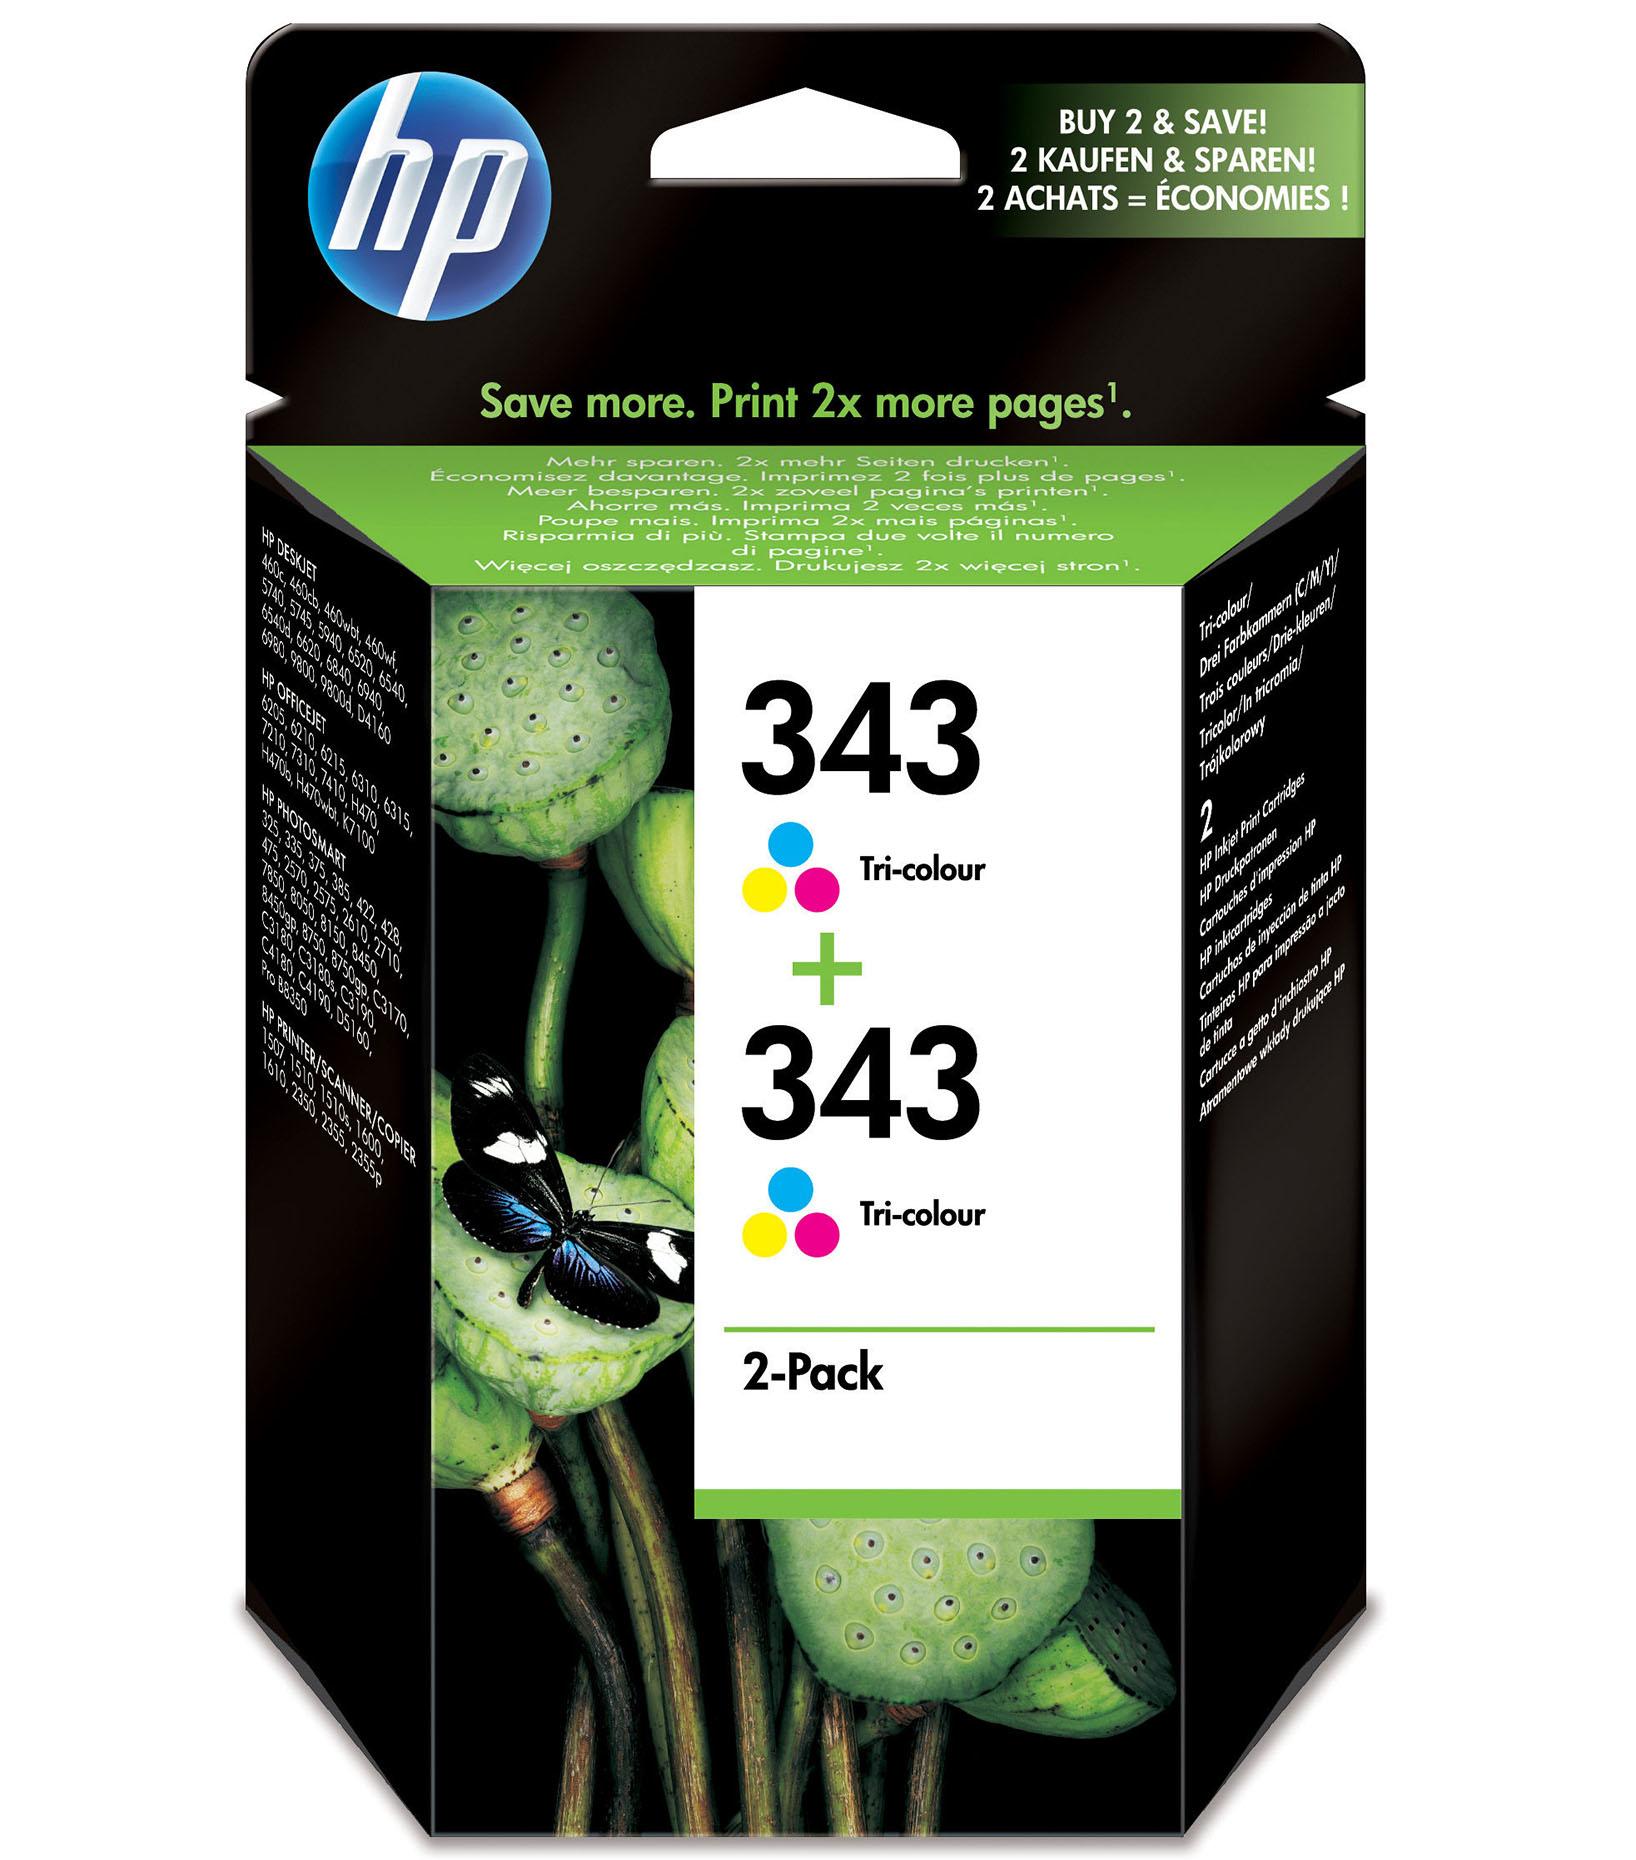 HP 343 Origineel Cyaan, Magenta, Geel Multipack 2 stuk(s)